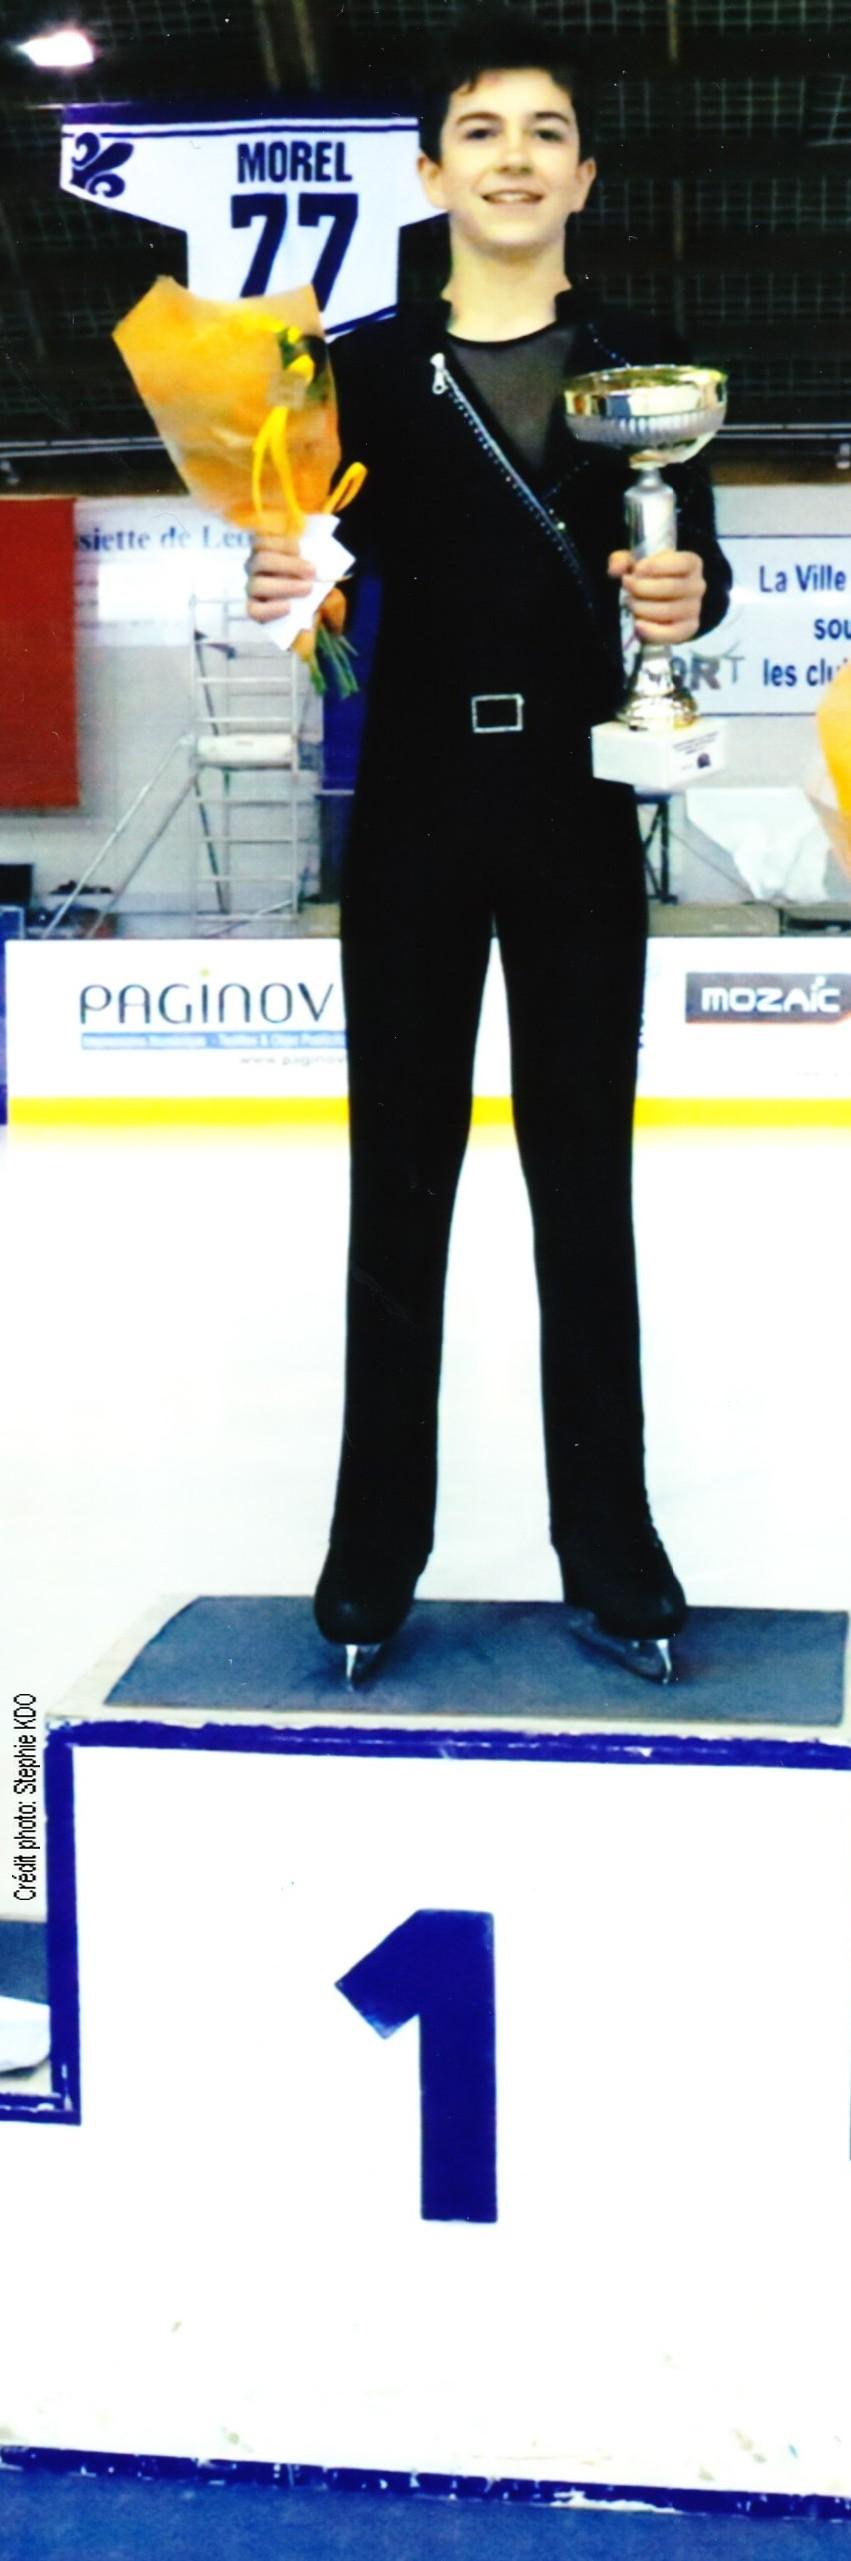 podium-landry-le-may-CF-2013-3.jpg